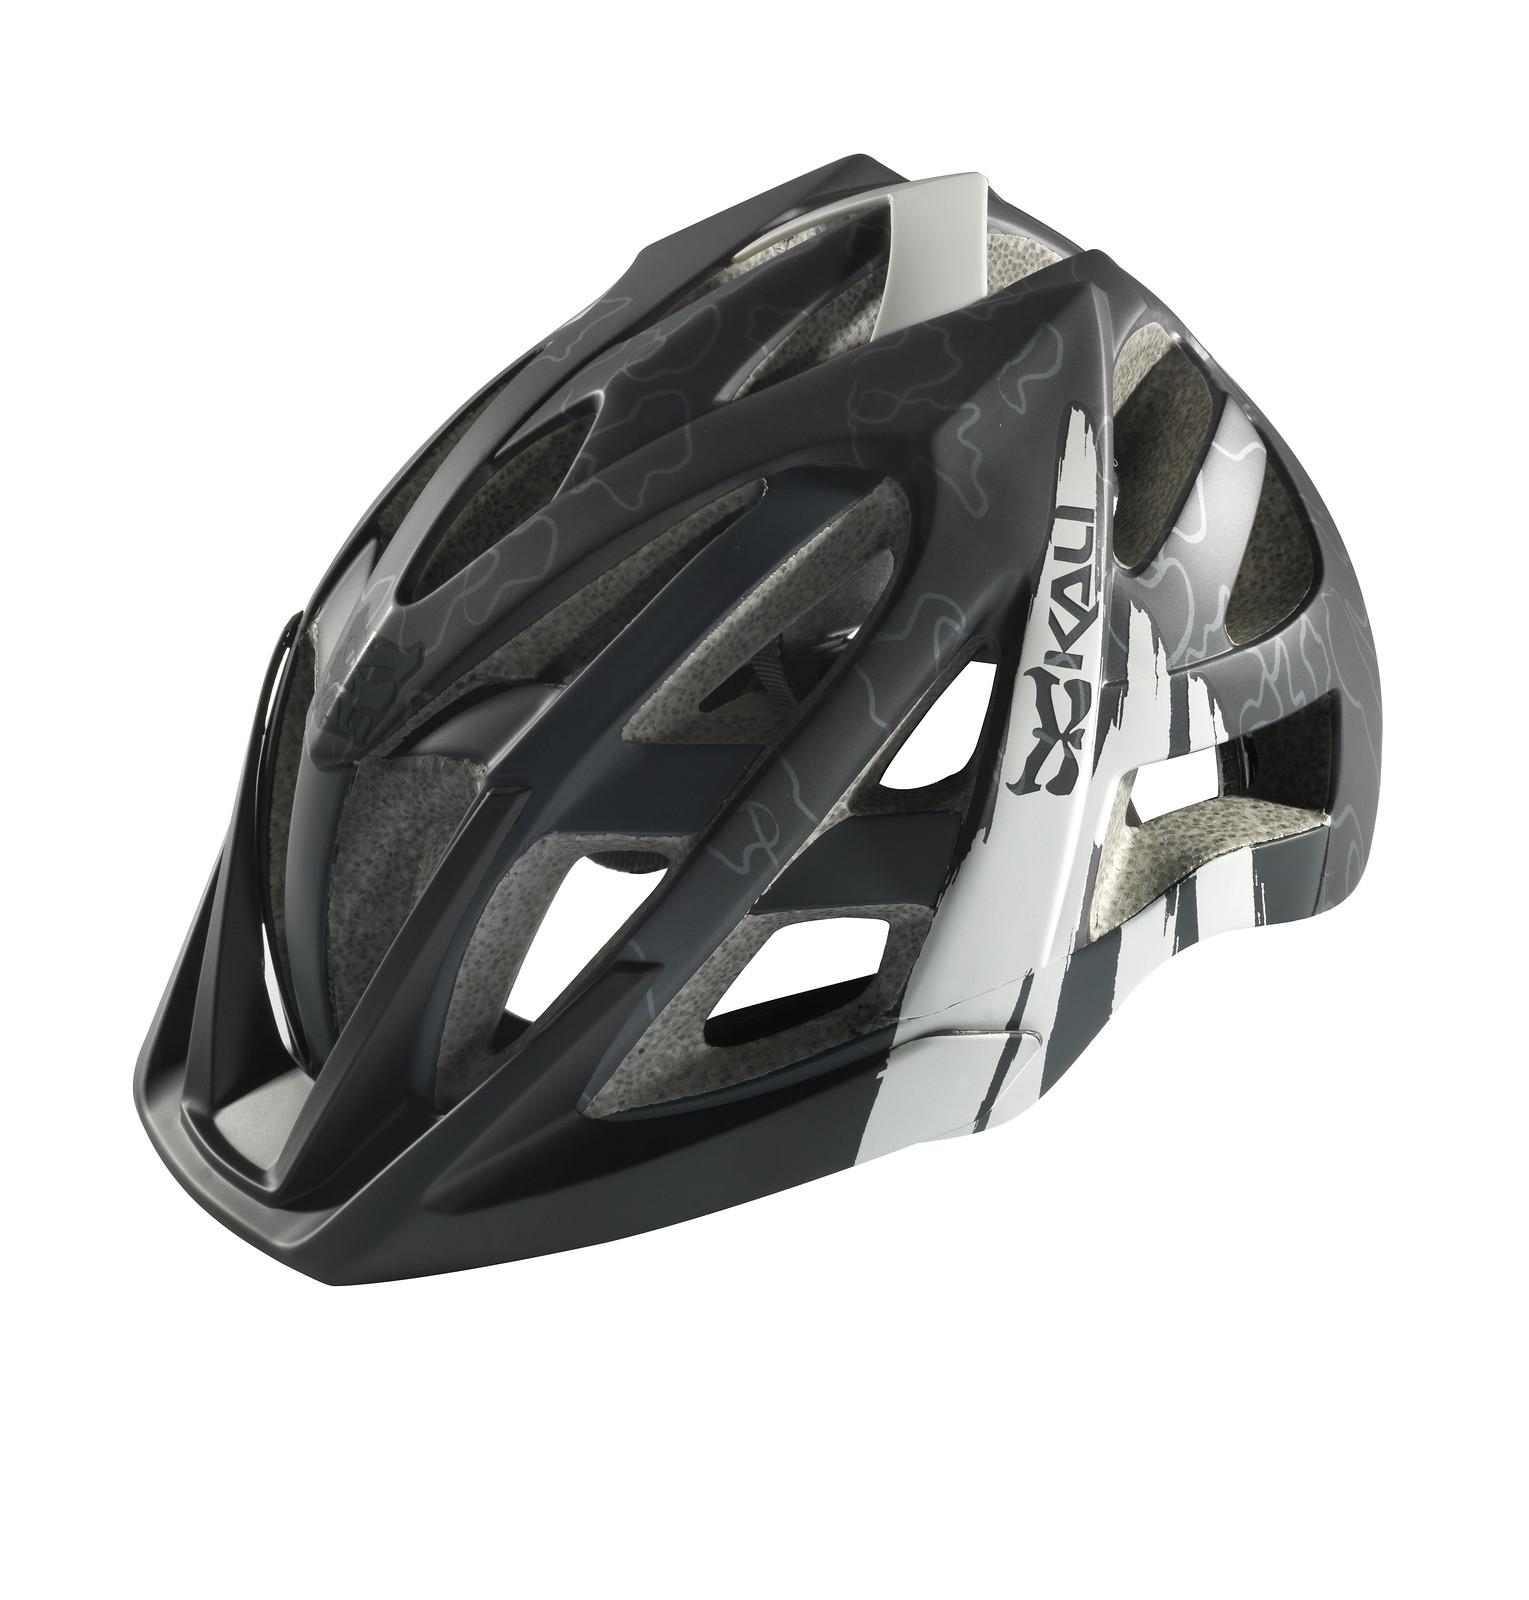 Kali Protectives Avita Fiberglass Helmet 0036